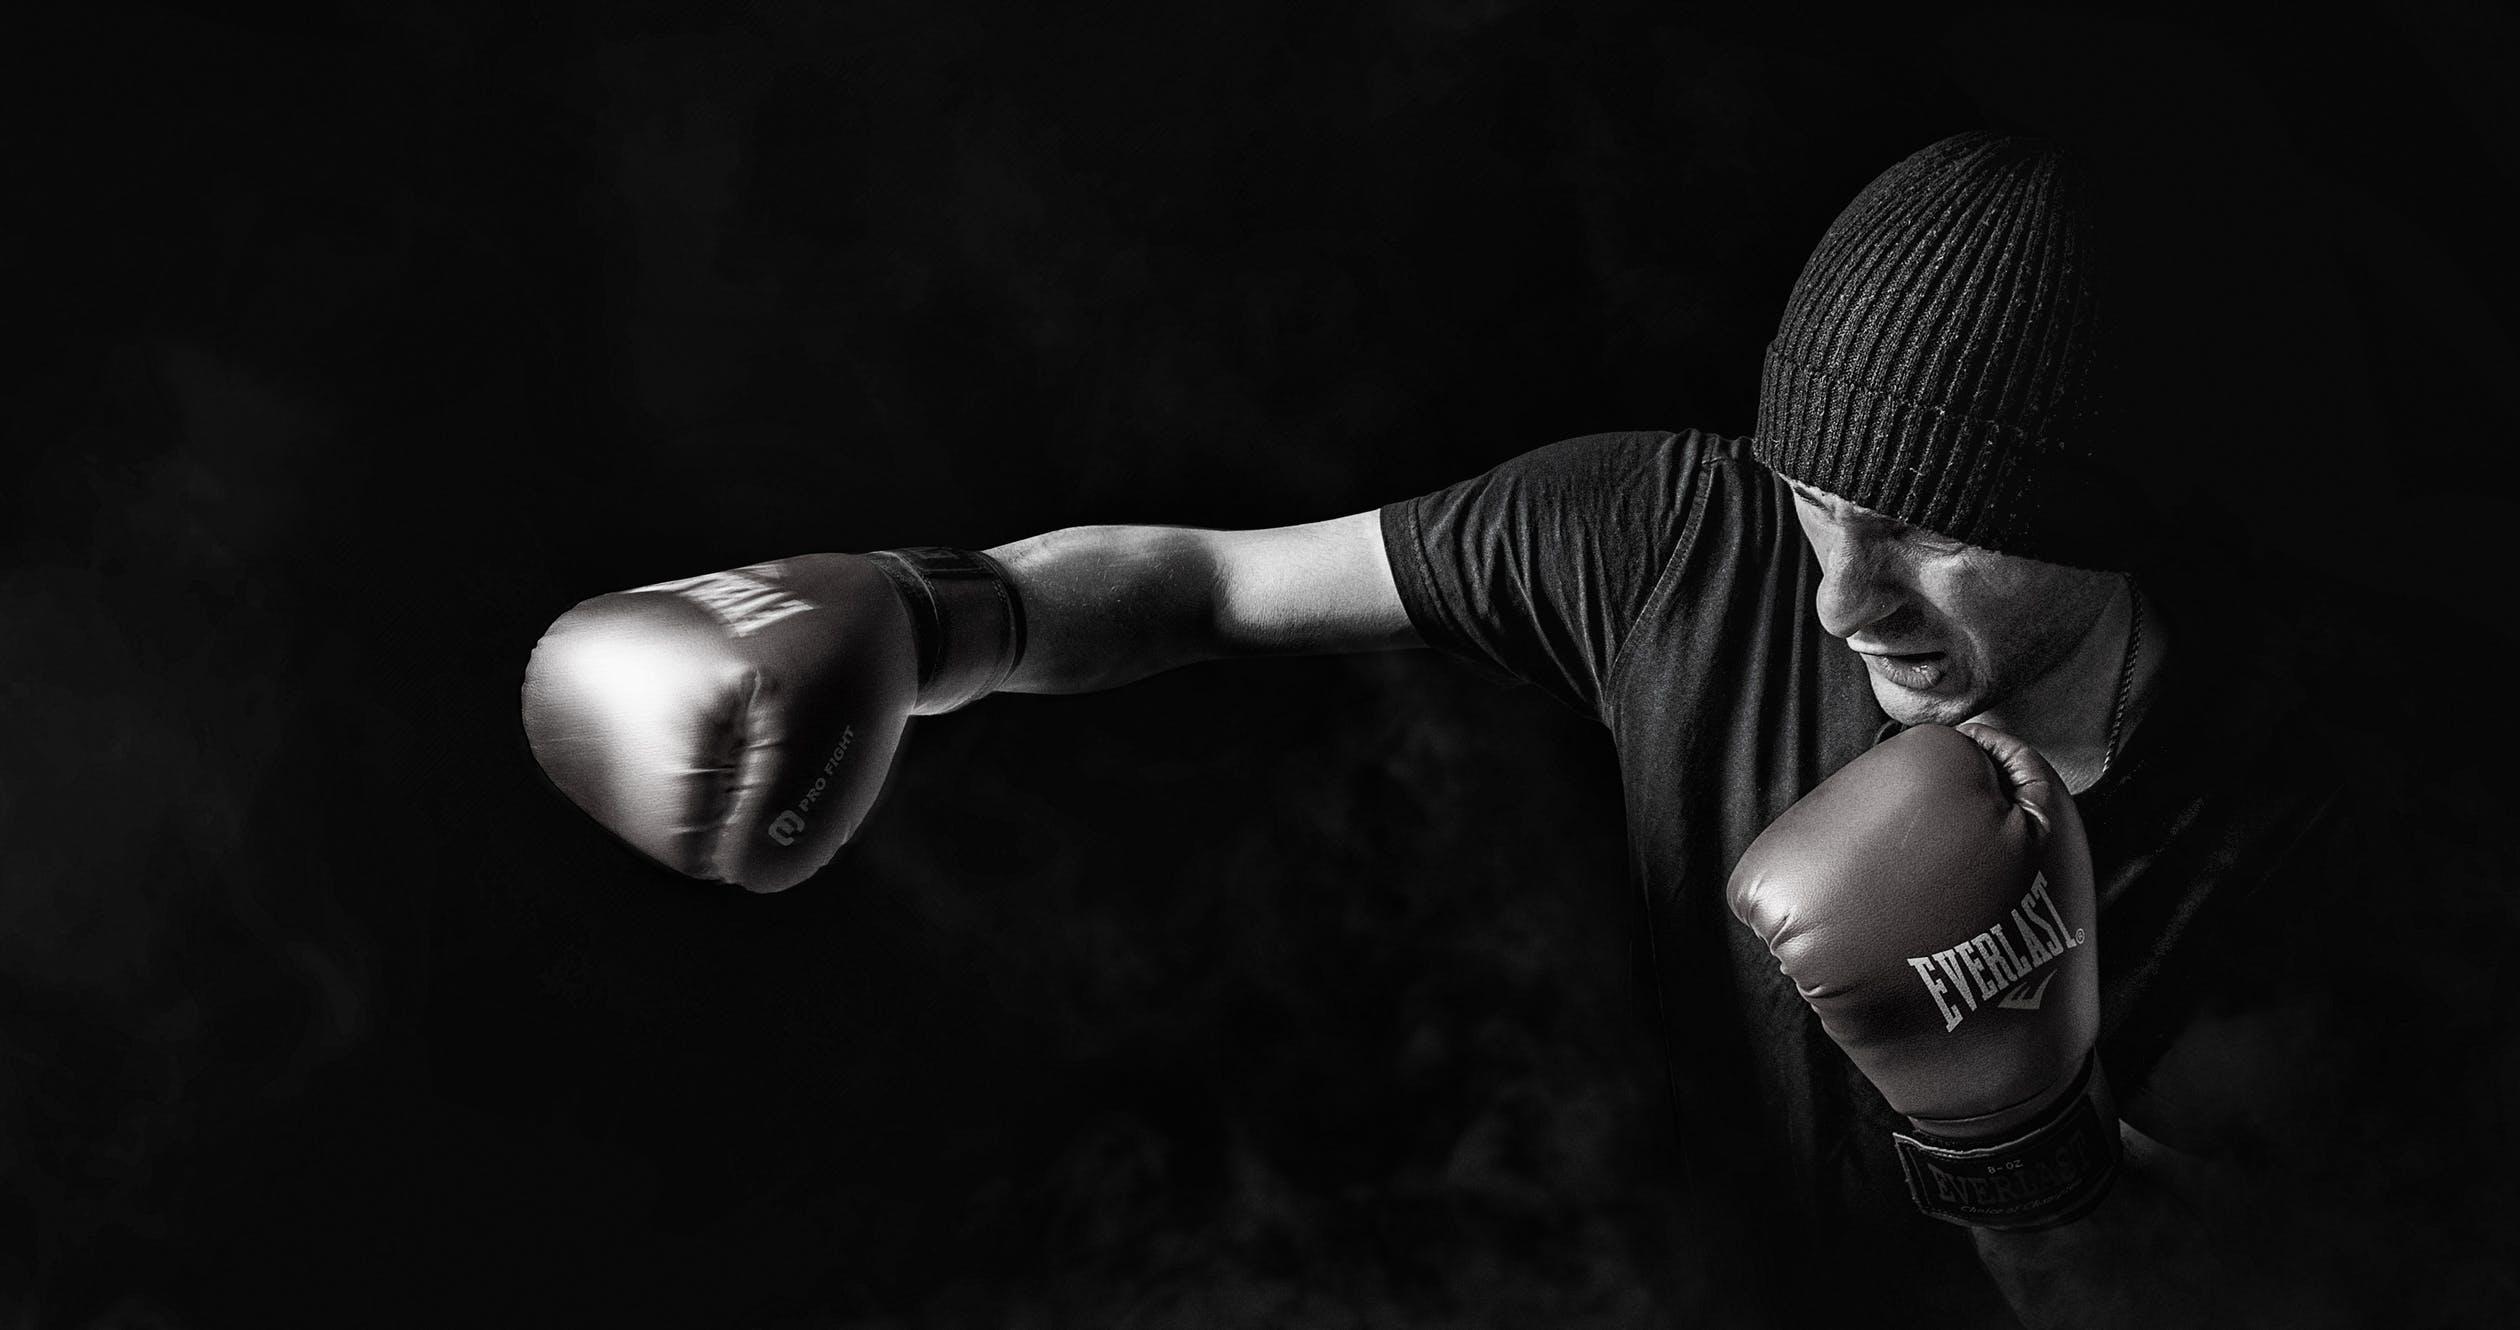 box sport men training